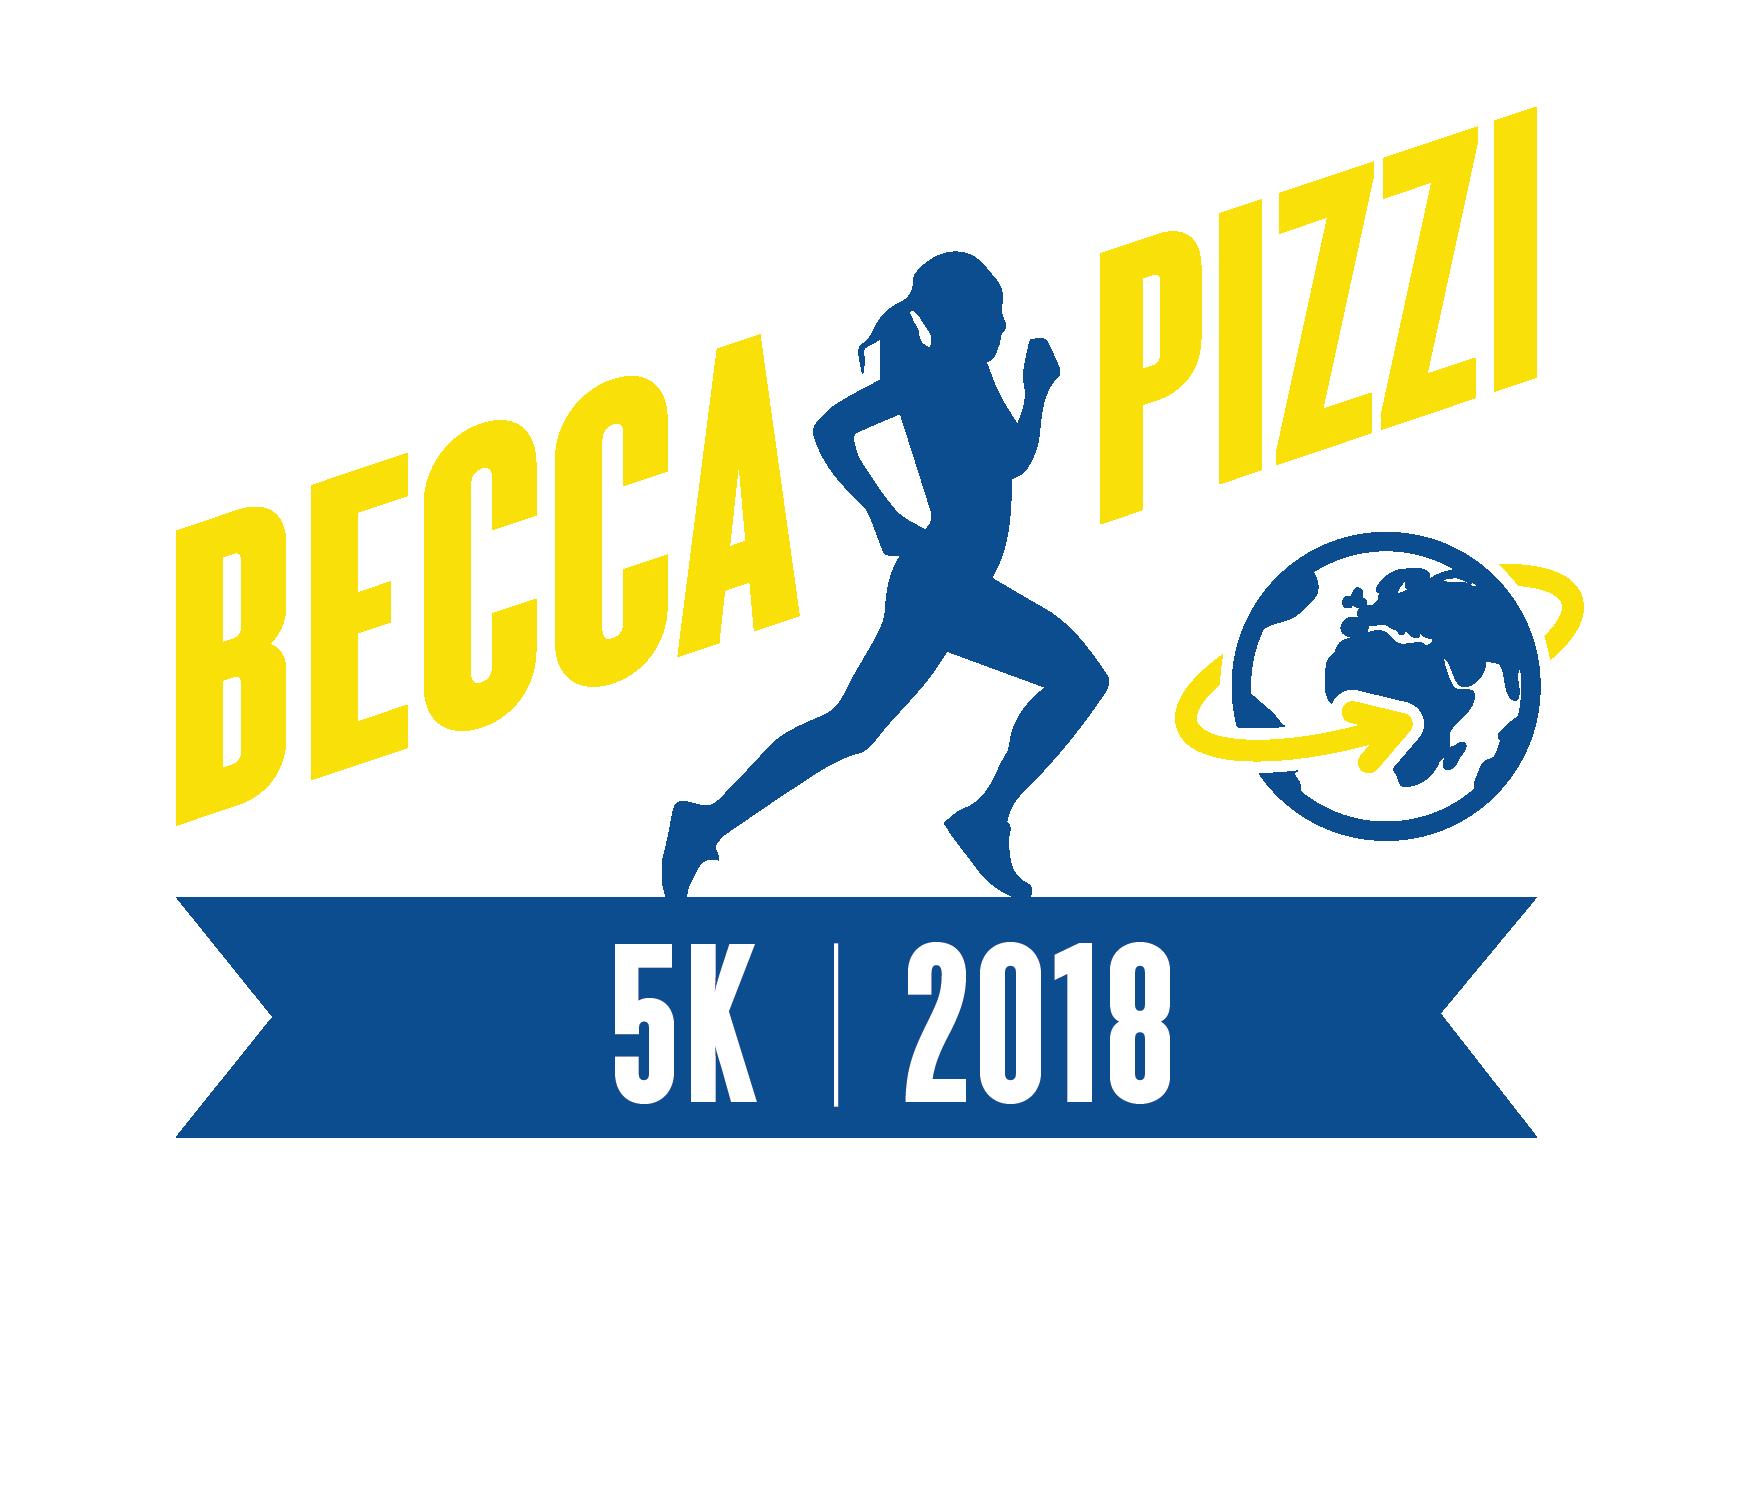 Becca logo 2018 01